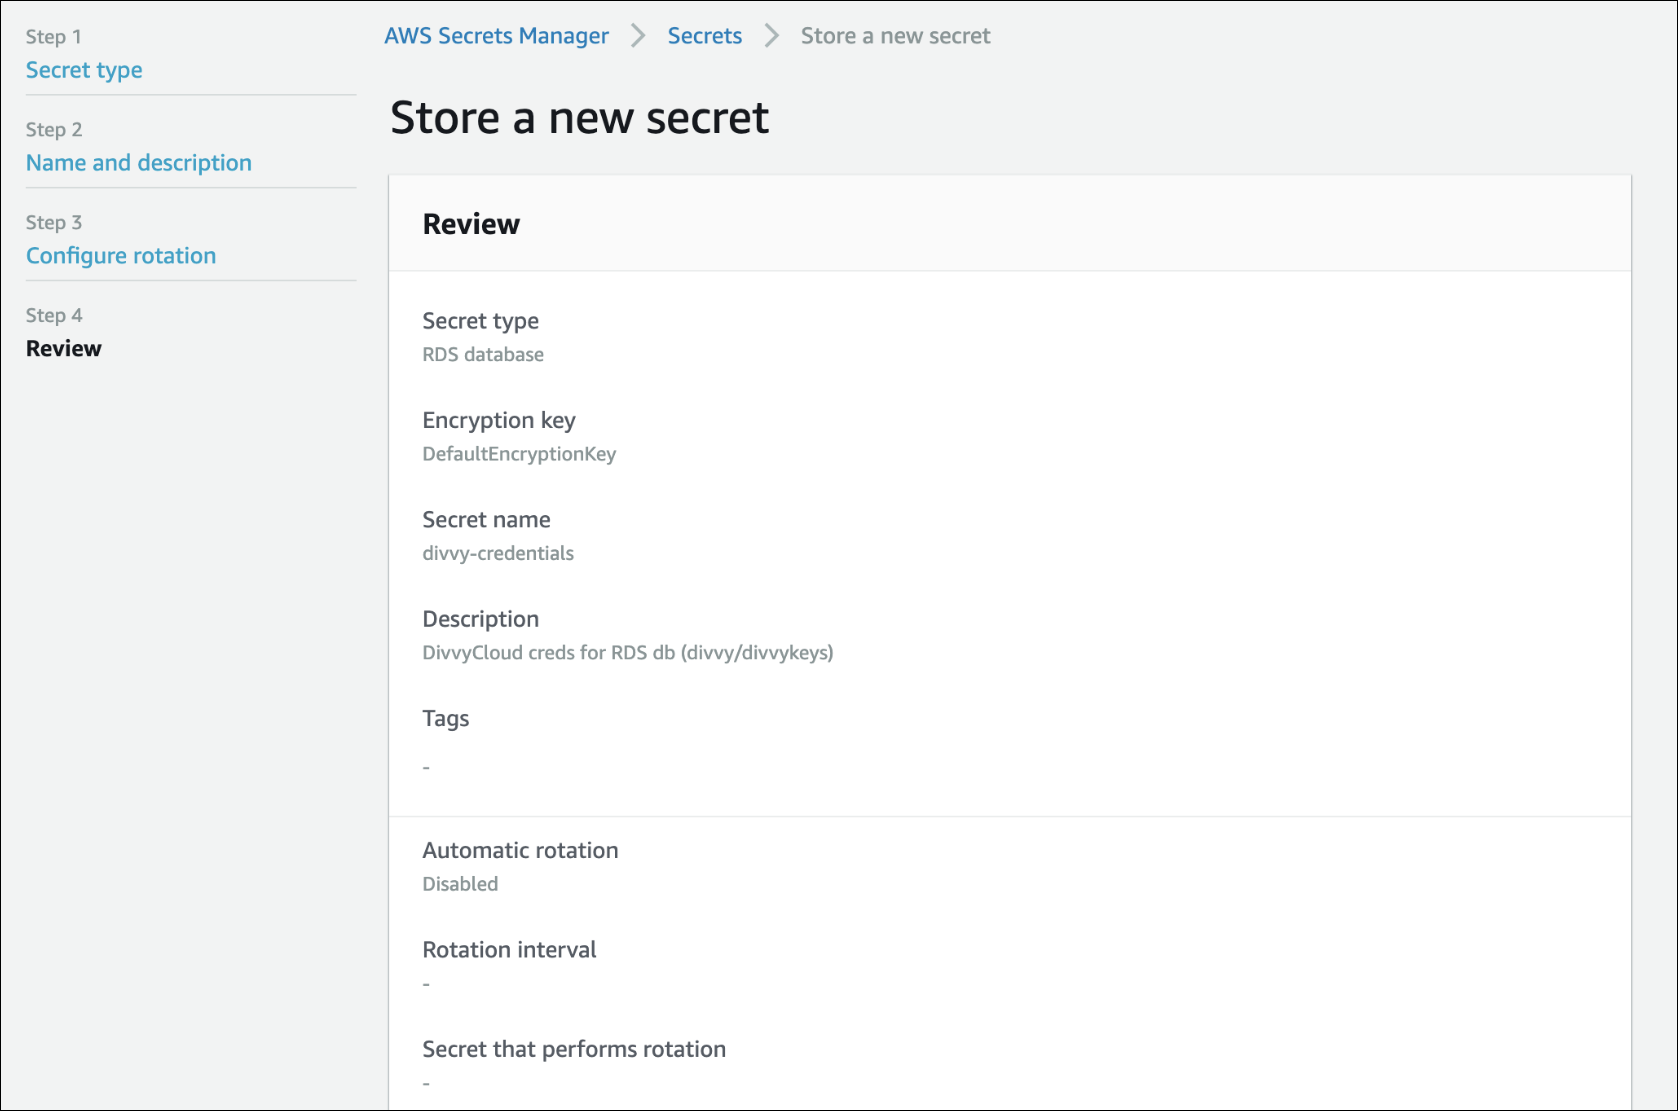 Store a new secret